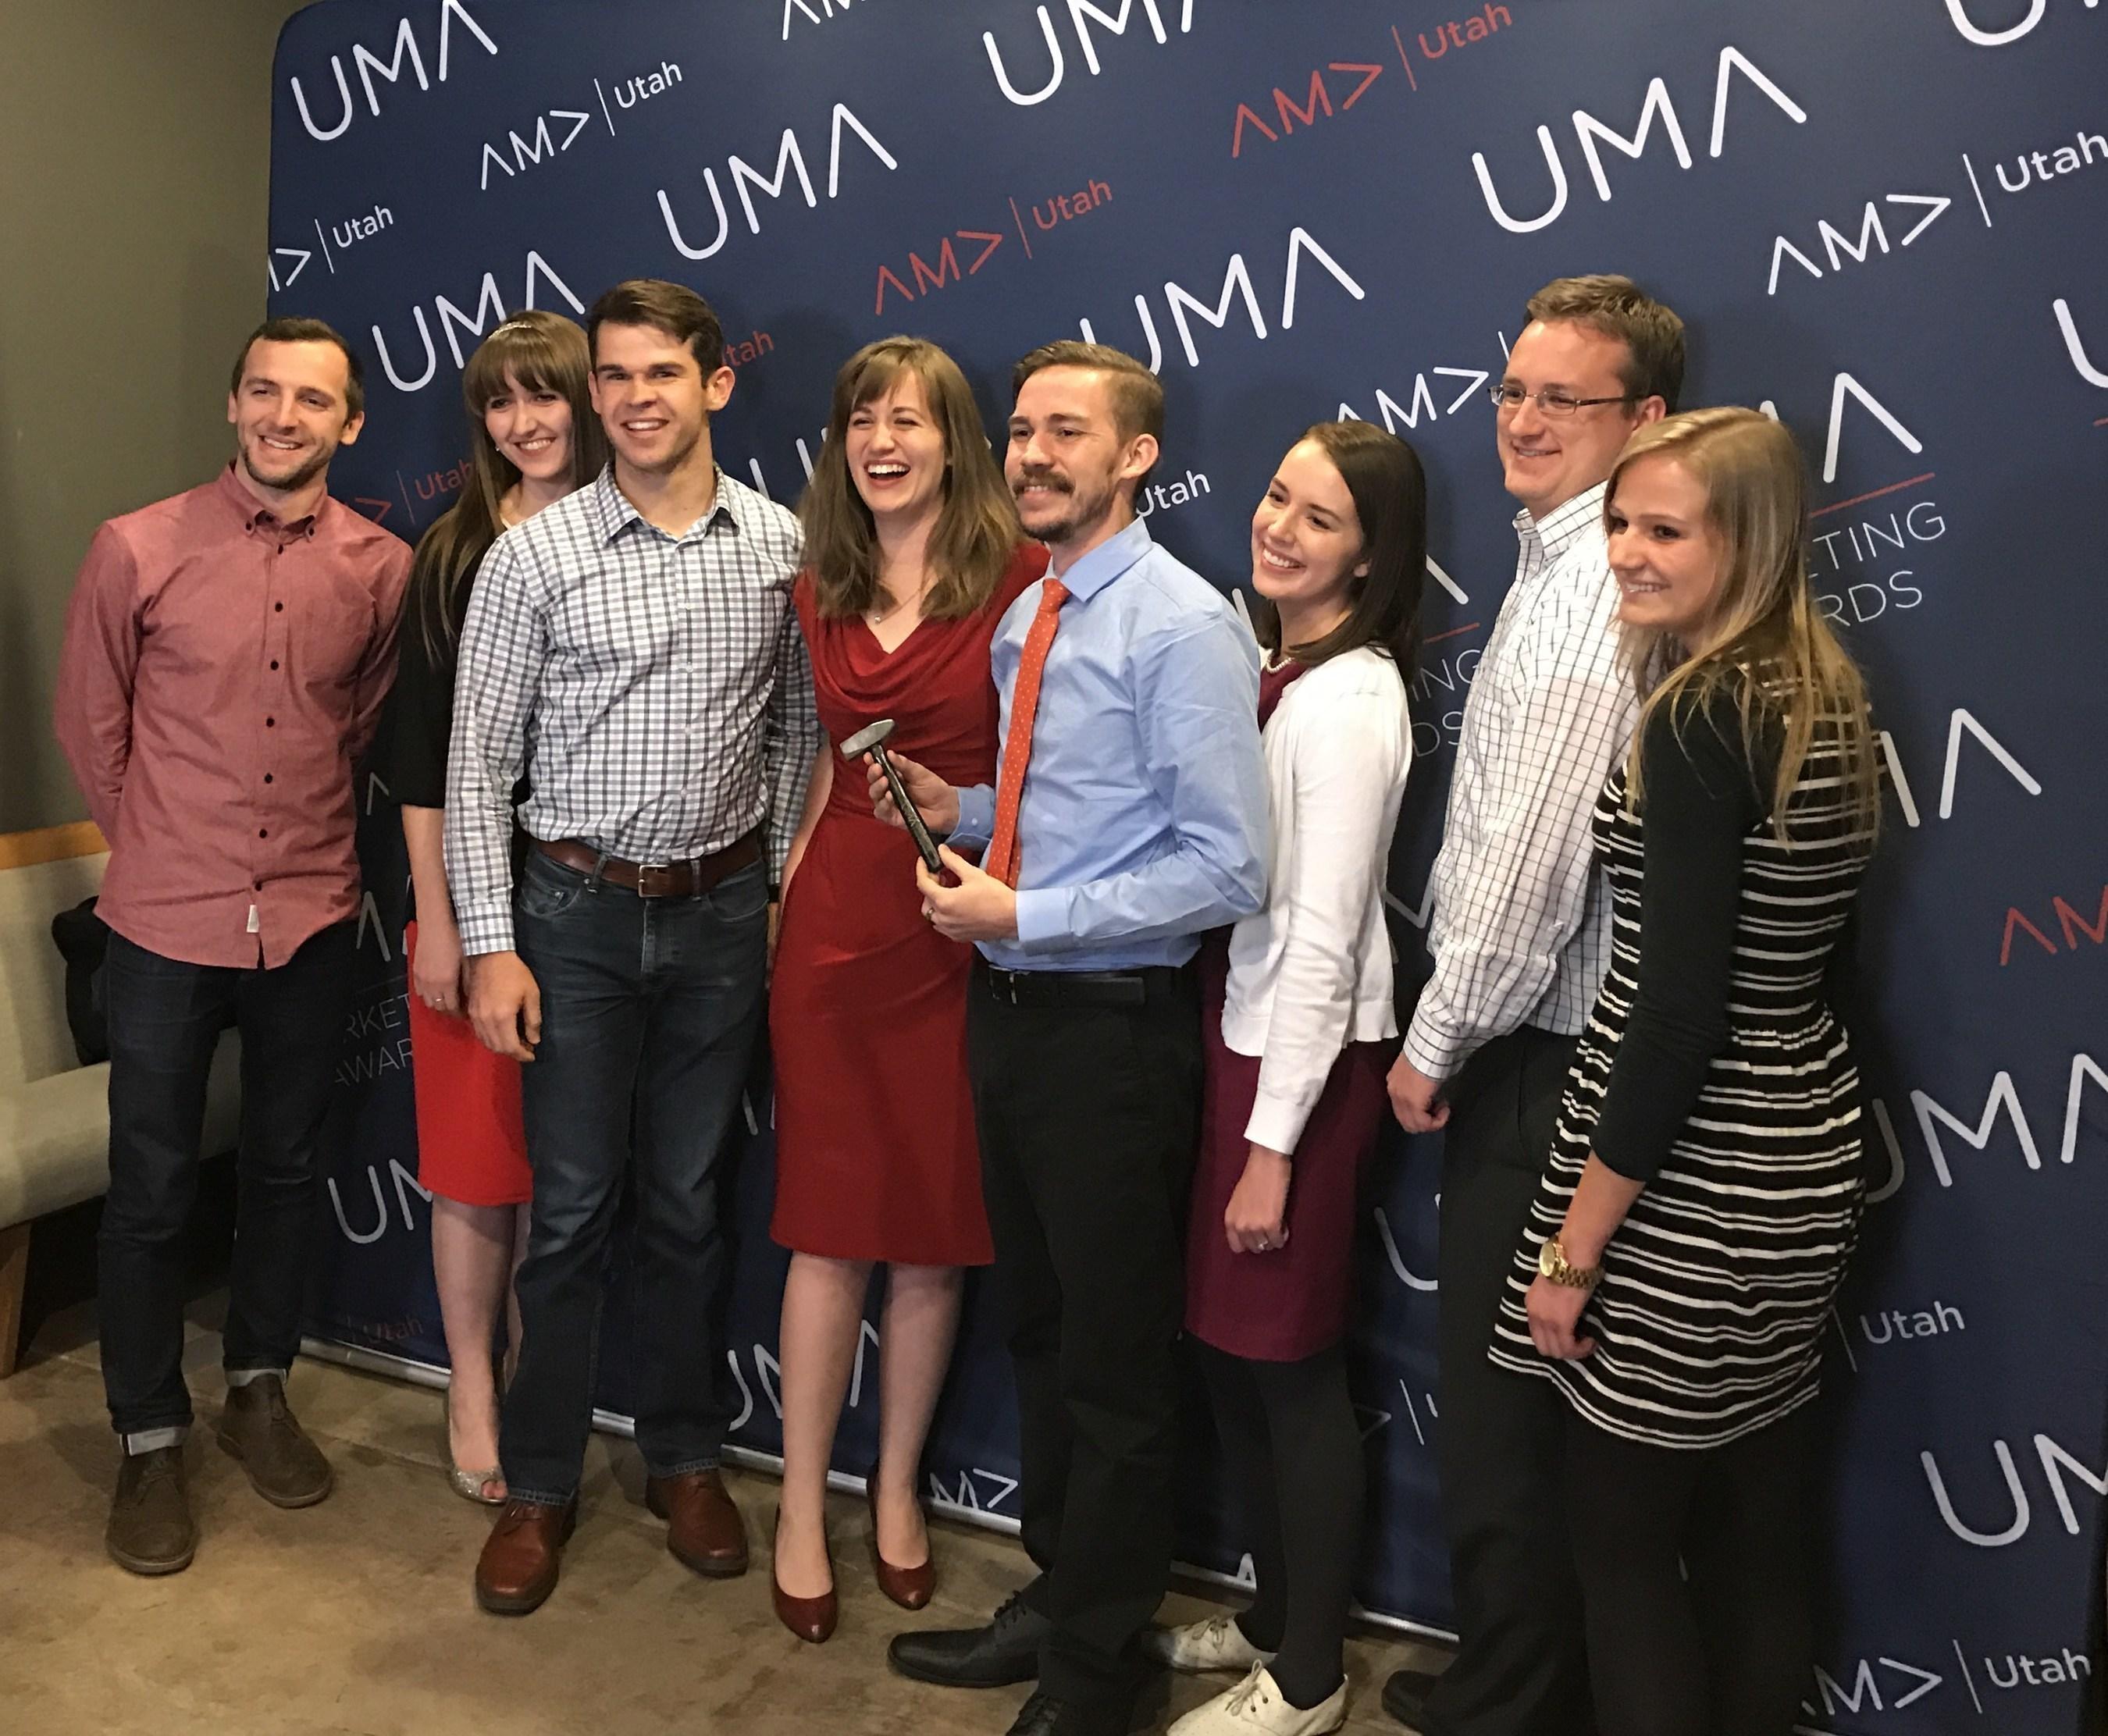 The Lucid Software marketing team at the Utah Marketing Awards